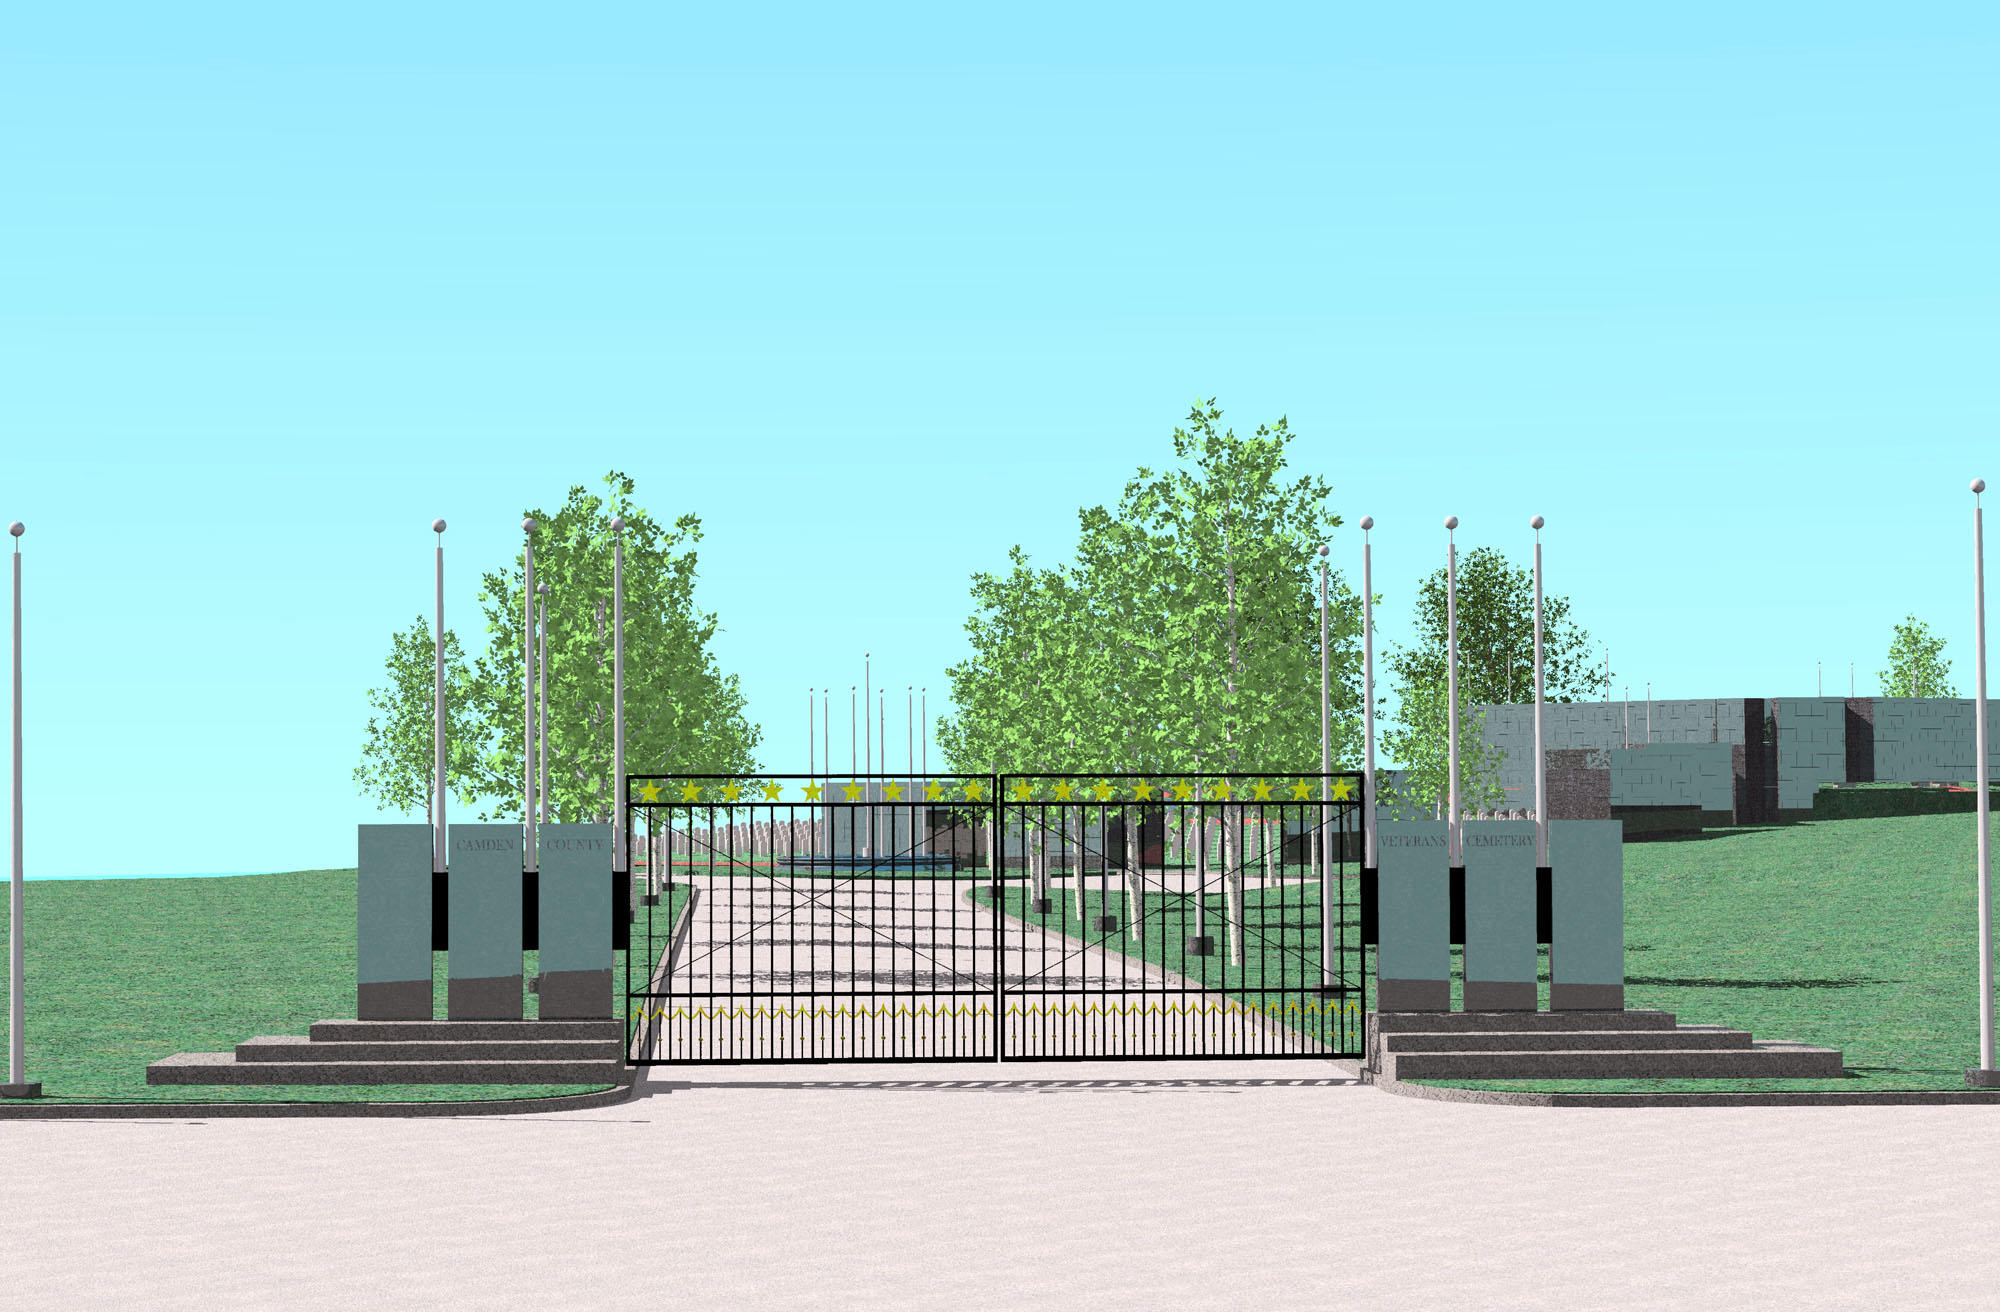 Camden County Veterans Cemetery image 1